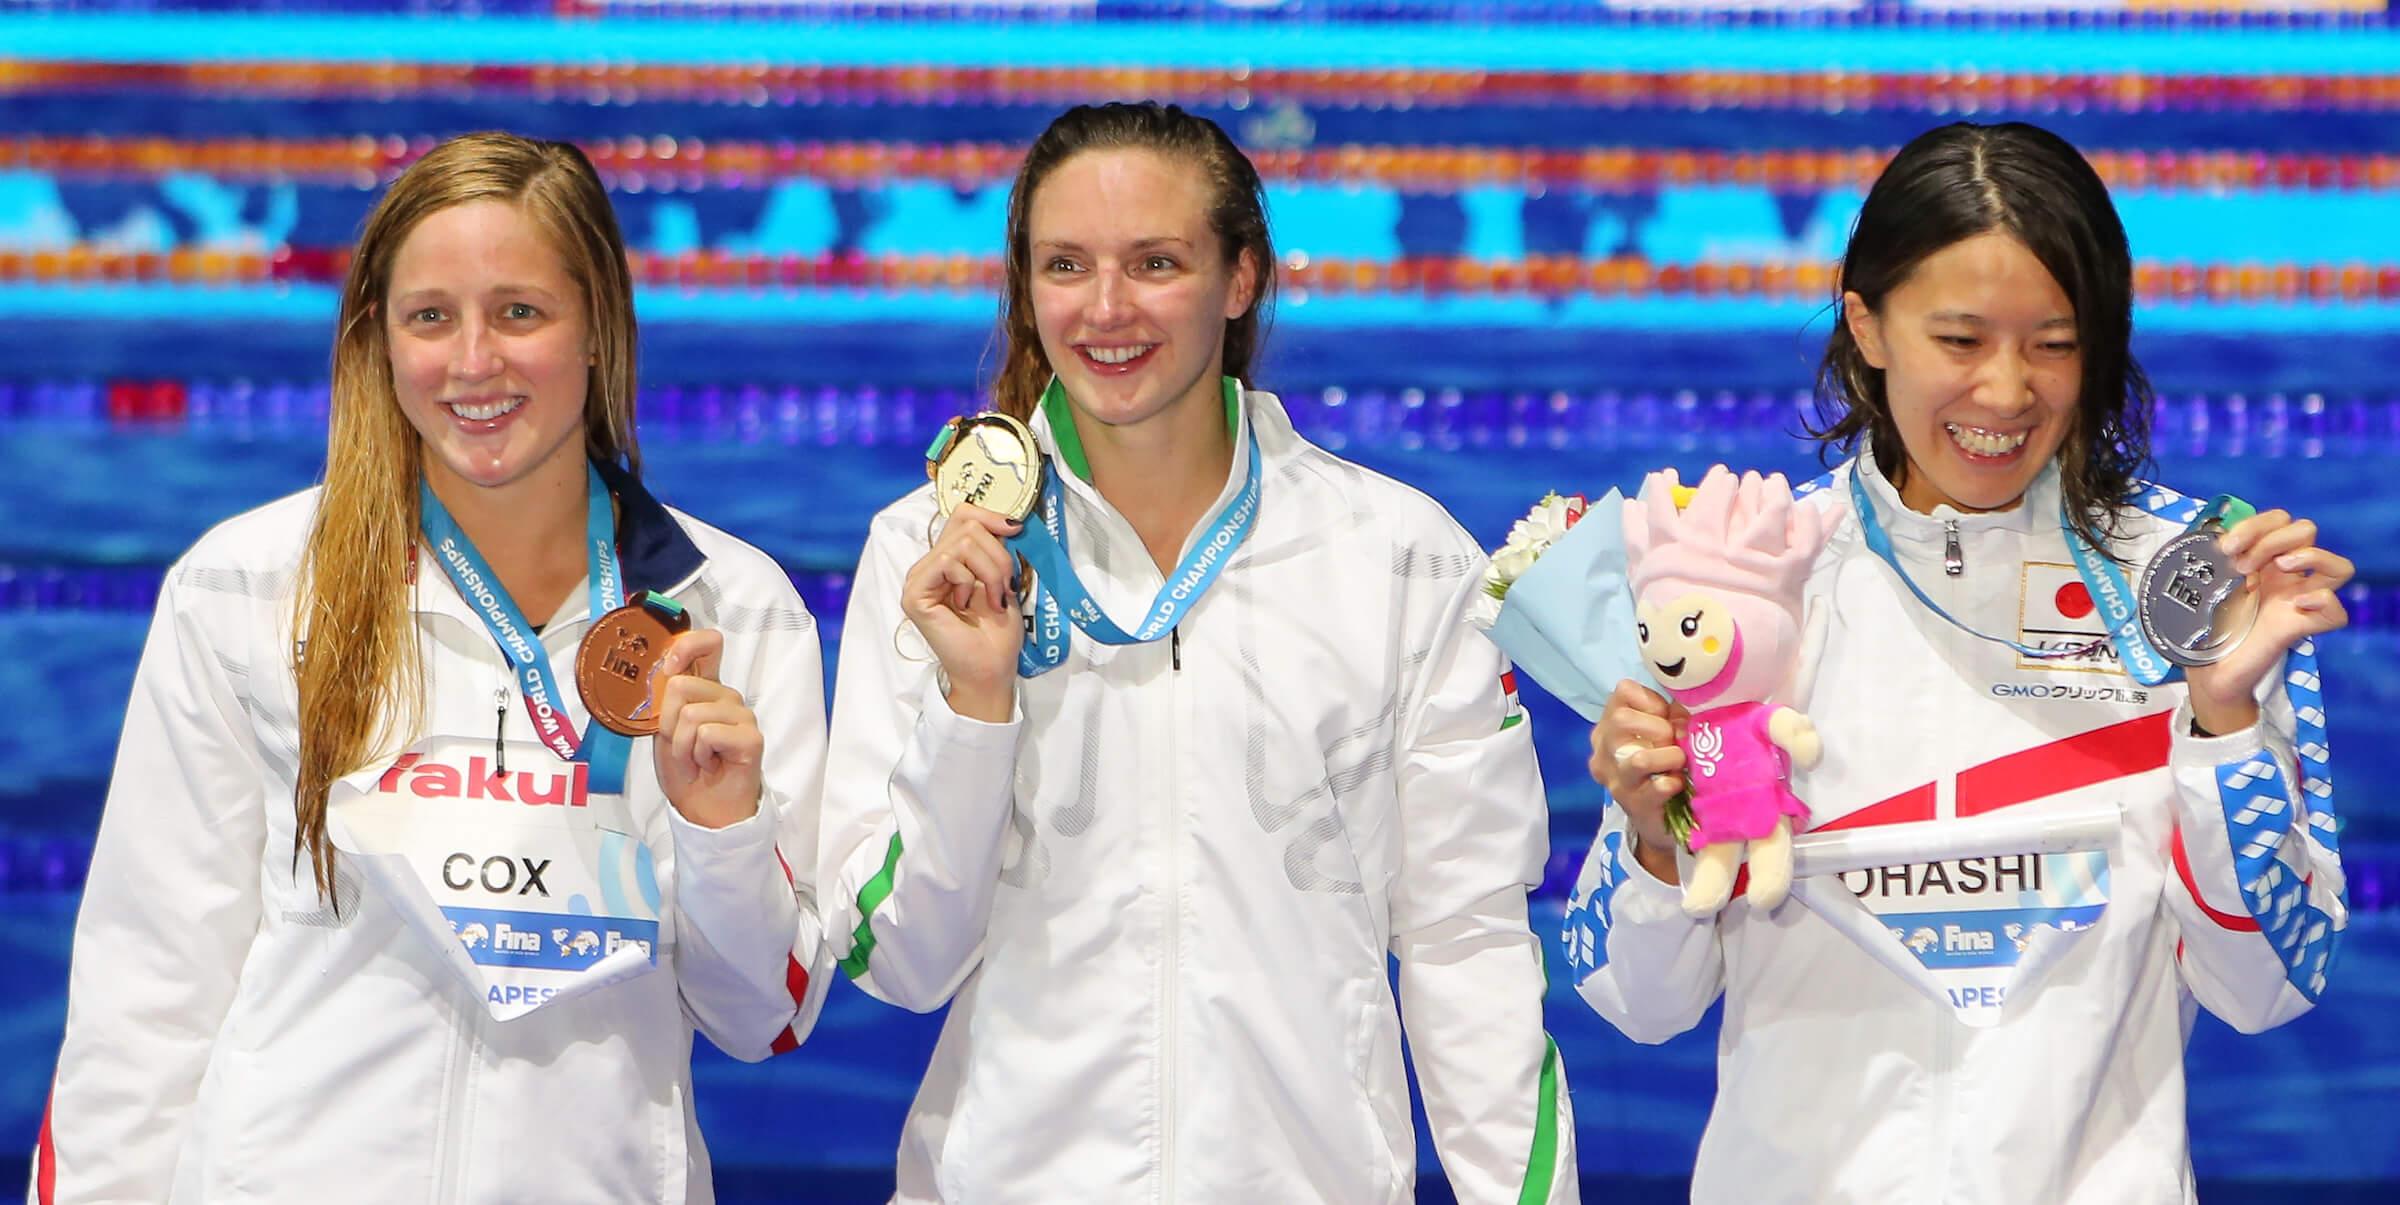 madisyn-СОХ-Катинка-Хосзу-Юи-ohashia-200-IM-медали на 2017 г. светове